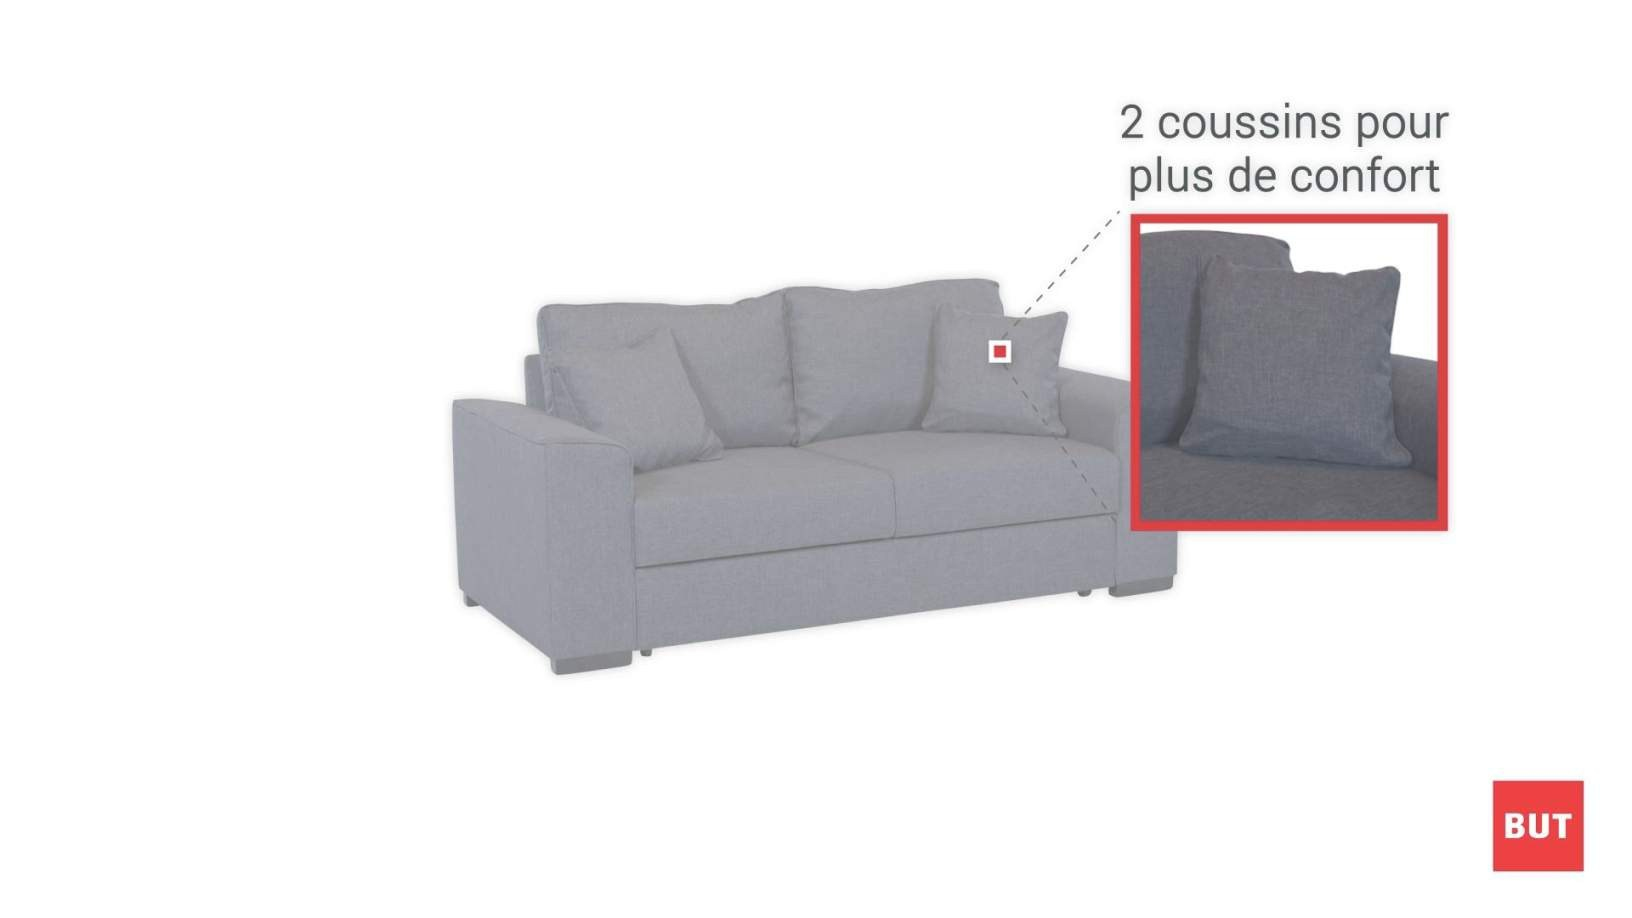 Canapé Friheten Ikea Inspirant Galerie Canaps D Angle Ikea Canap Duangle Convertible aspen Coloris